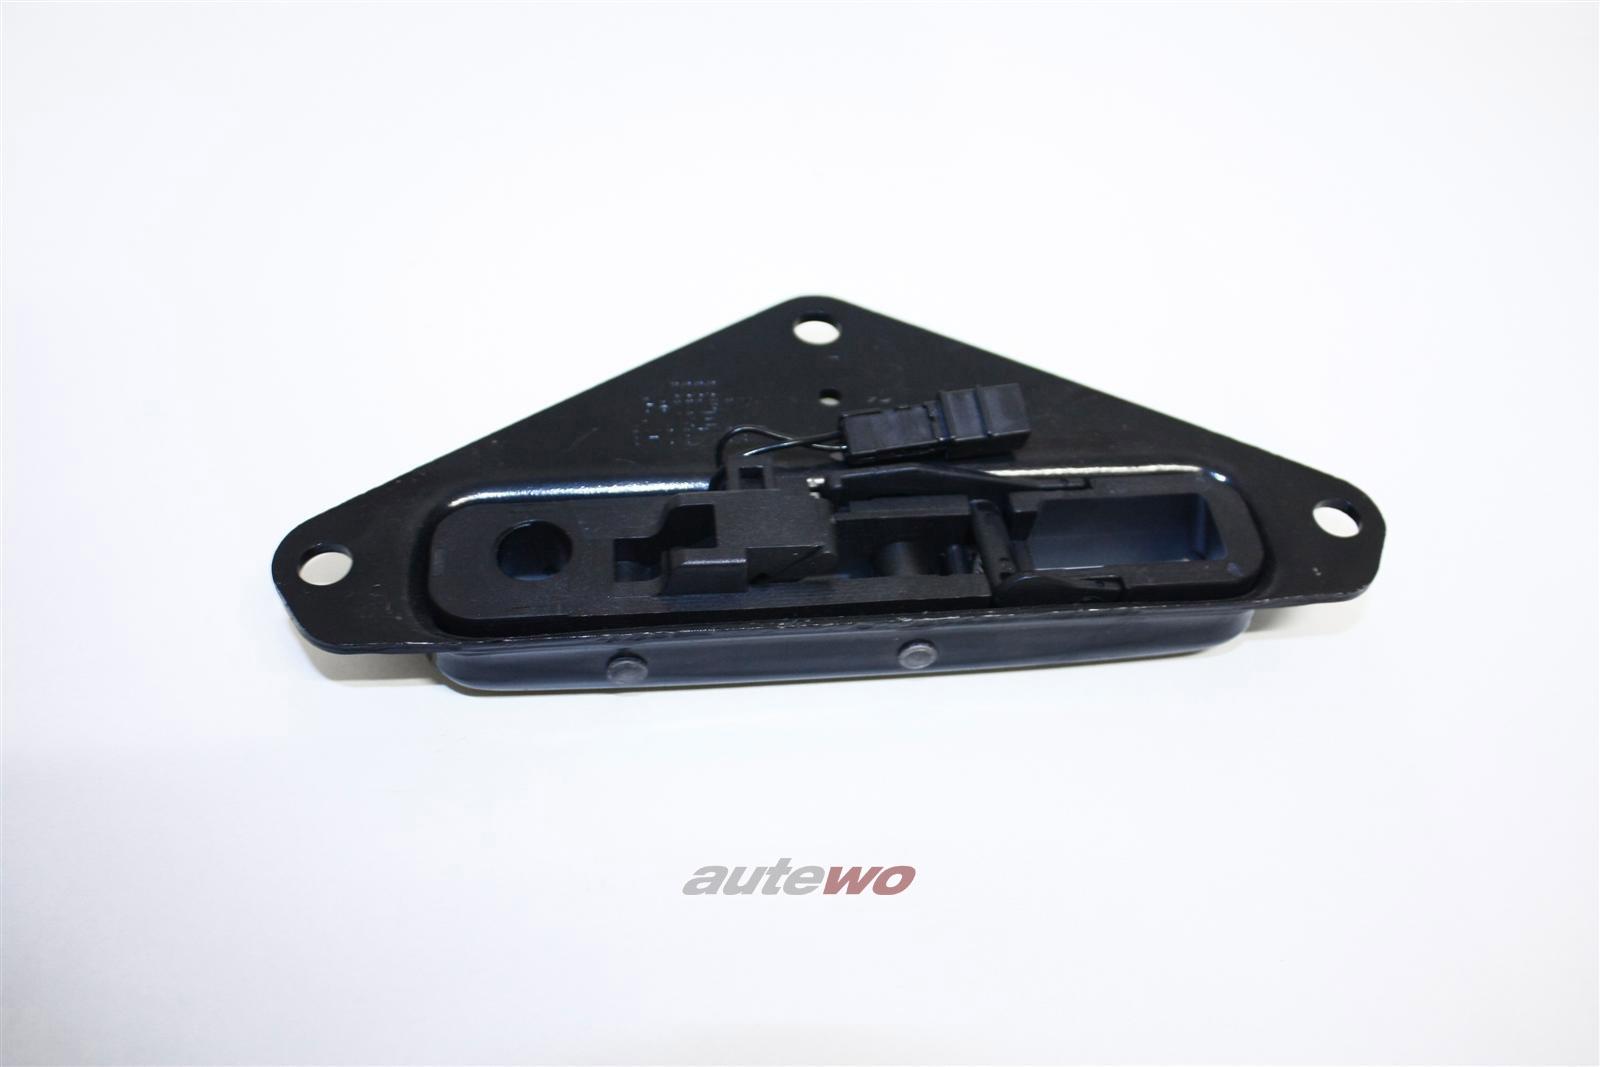 NEU! Audi A4/S4/RS4 Cabrio Verdeckverschluss Unterteil + Kontaktschalter Links 8